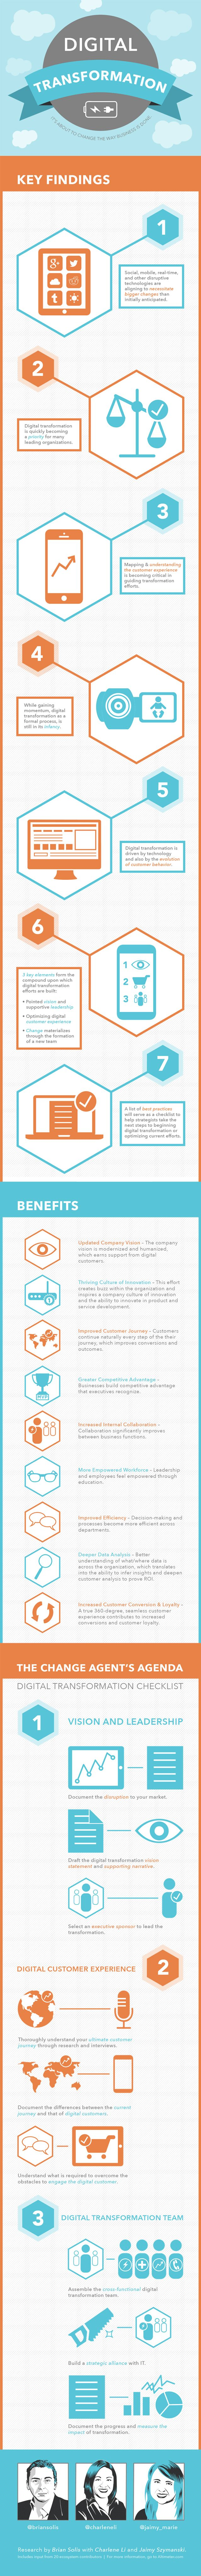 Digital Transformation and the Digital Customer Experience   Inc.com